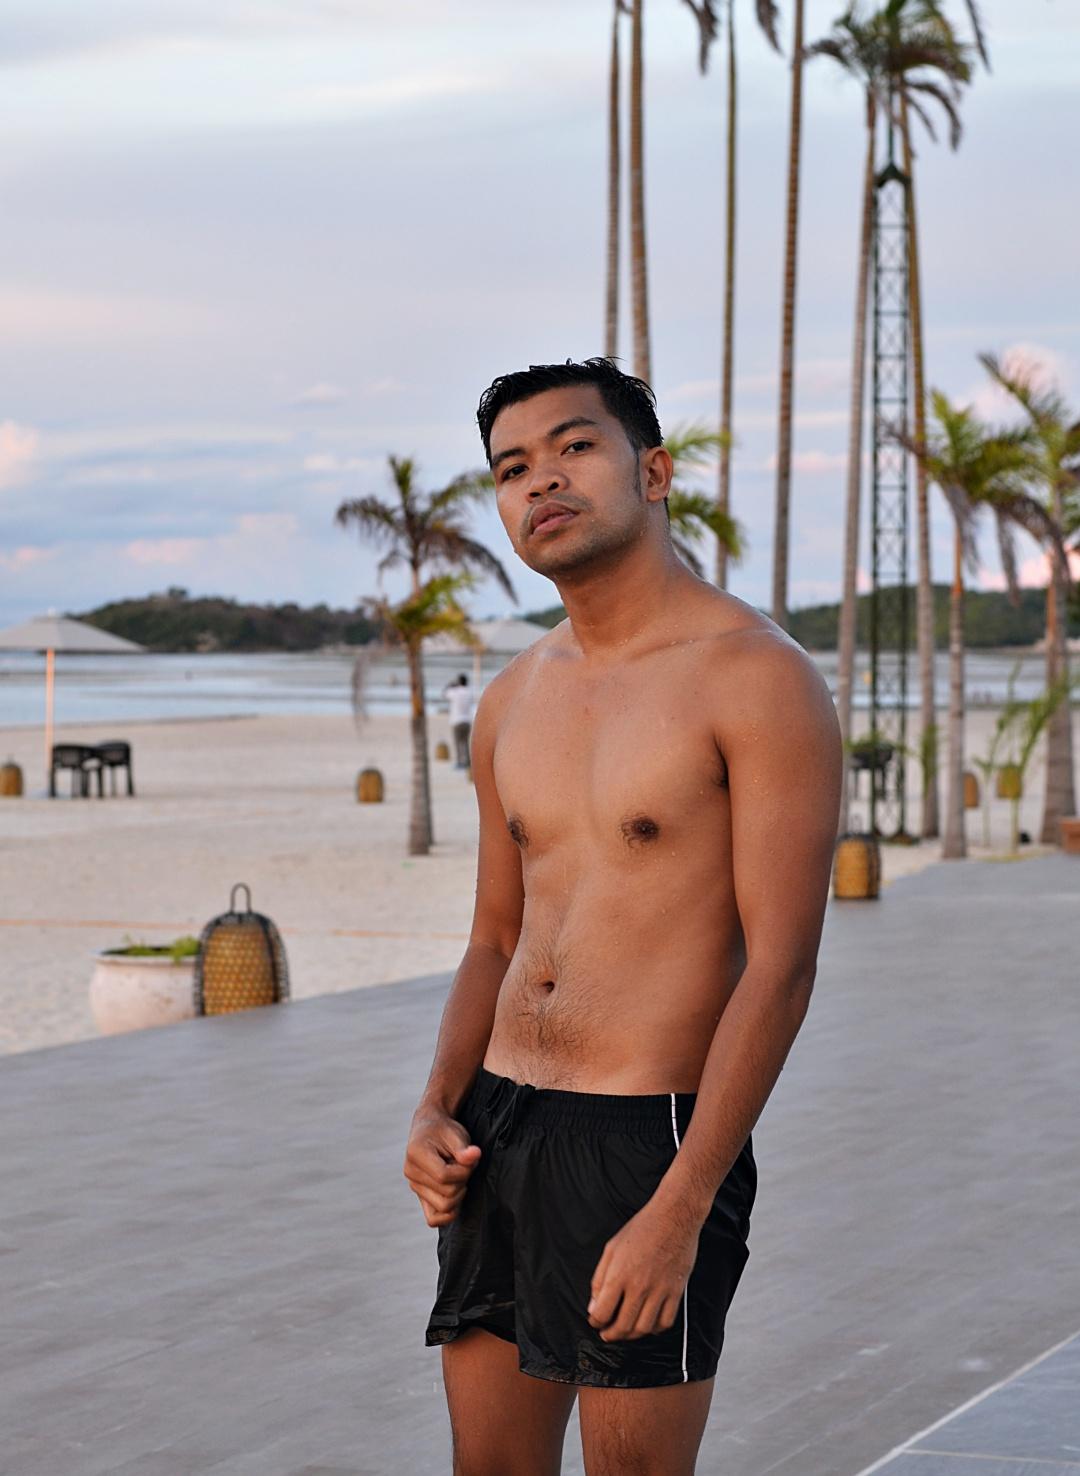 KANDAYA-BLOGGER-Cebu-FASHION-ALMOSTABLOGGER.jpg